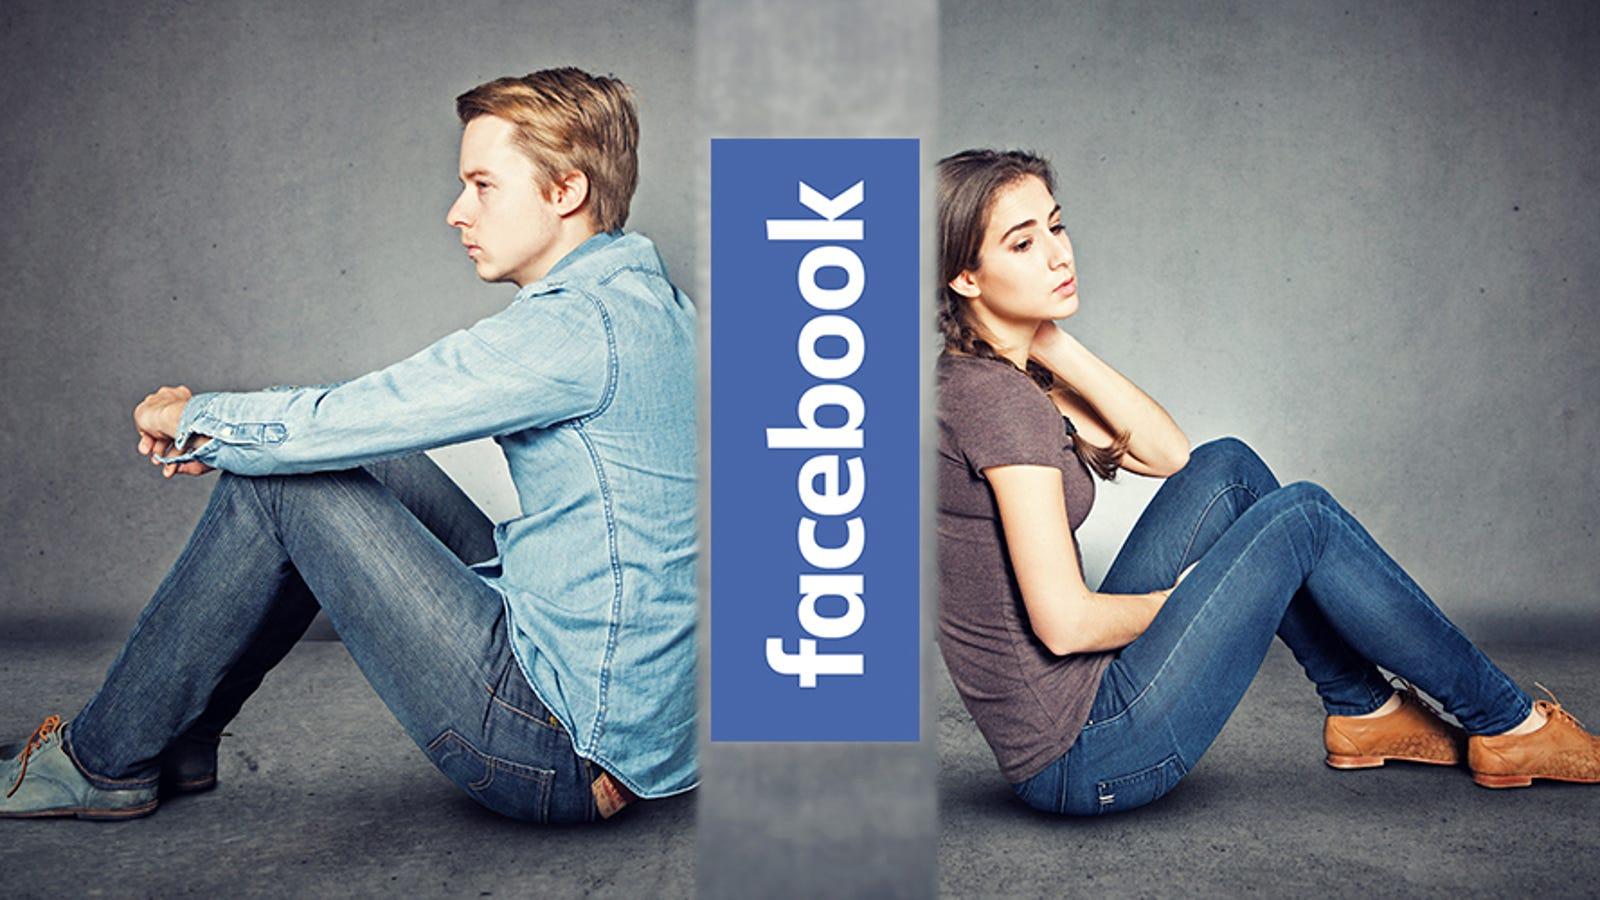 Facebook Is Testing a Weird Way to Make Break-Ups Easier